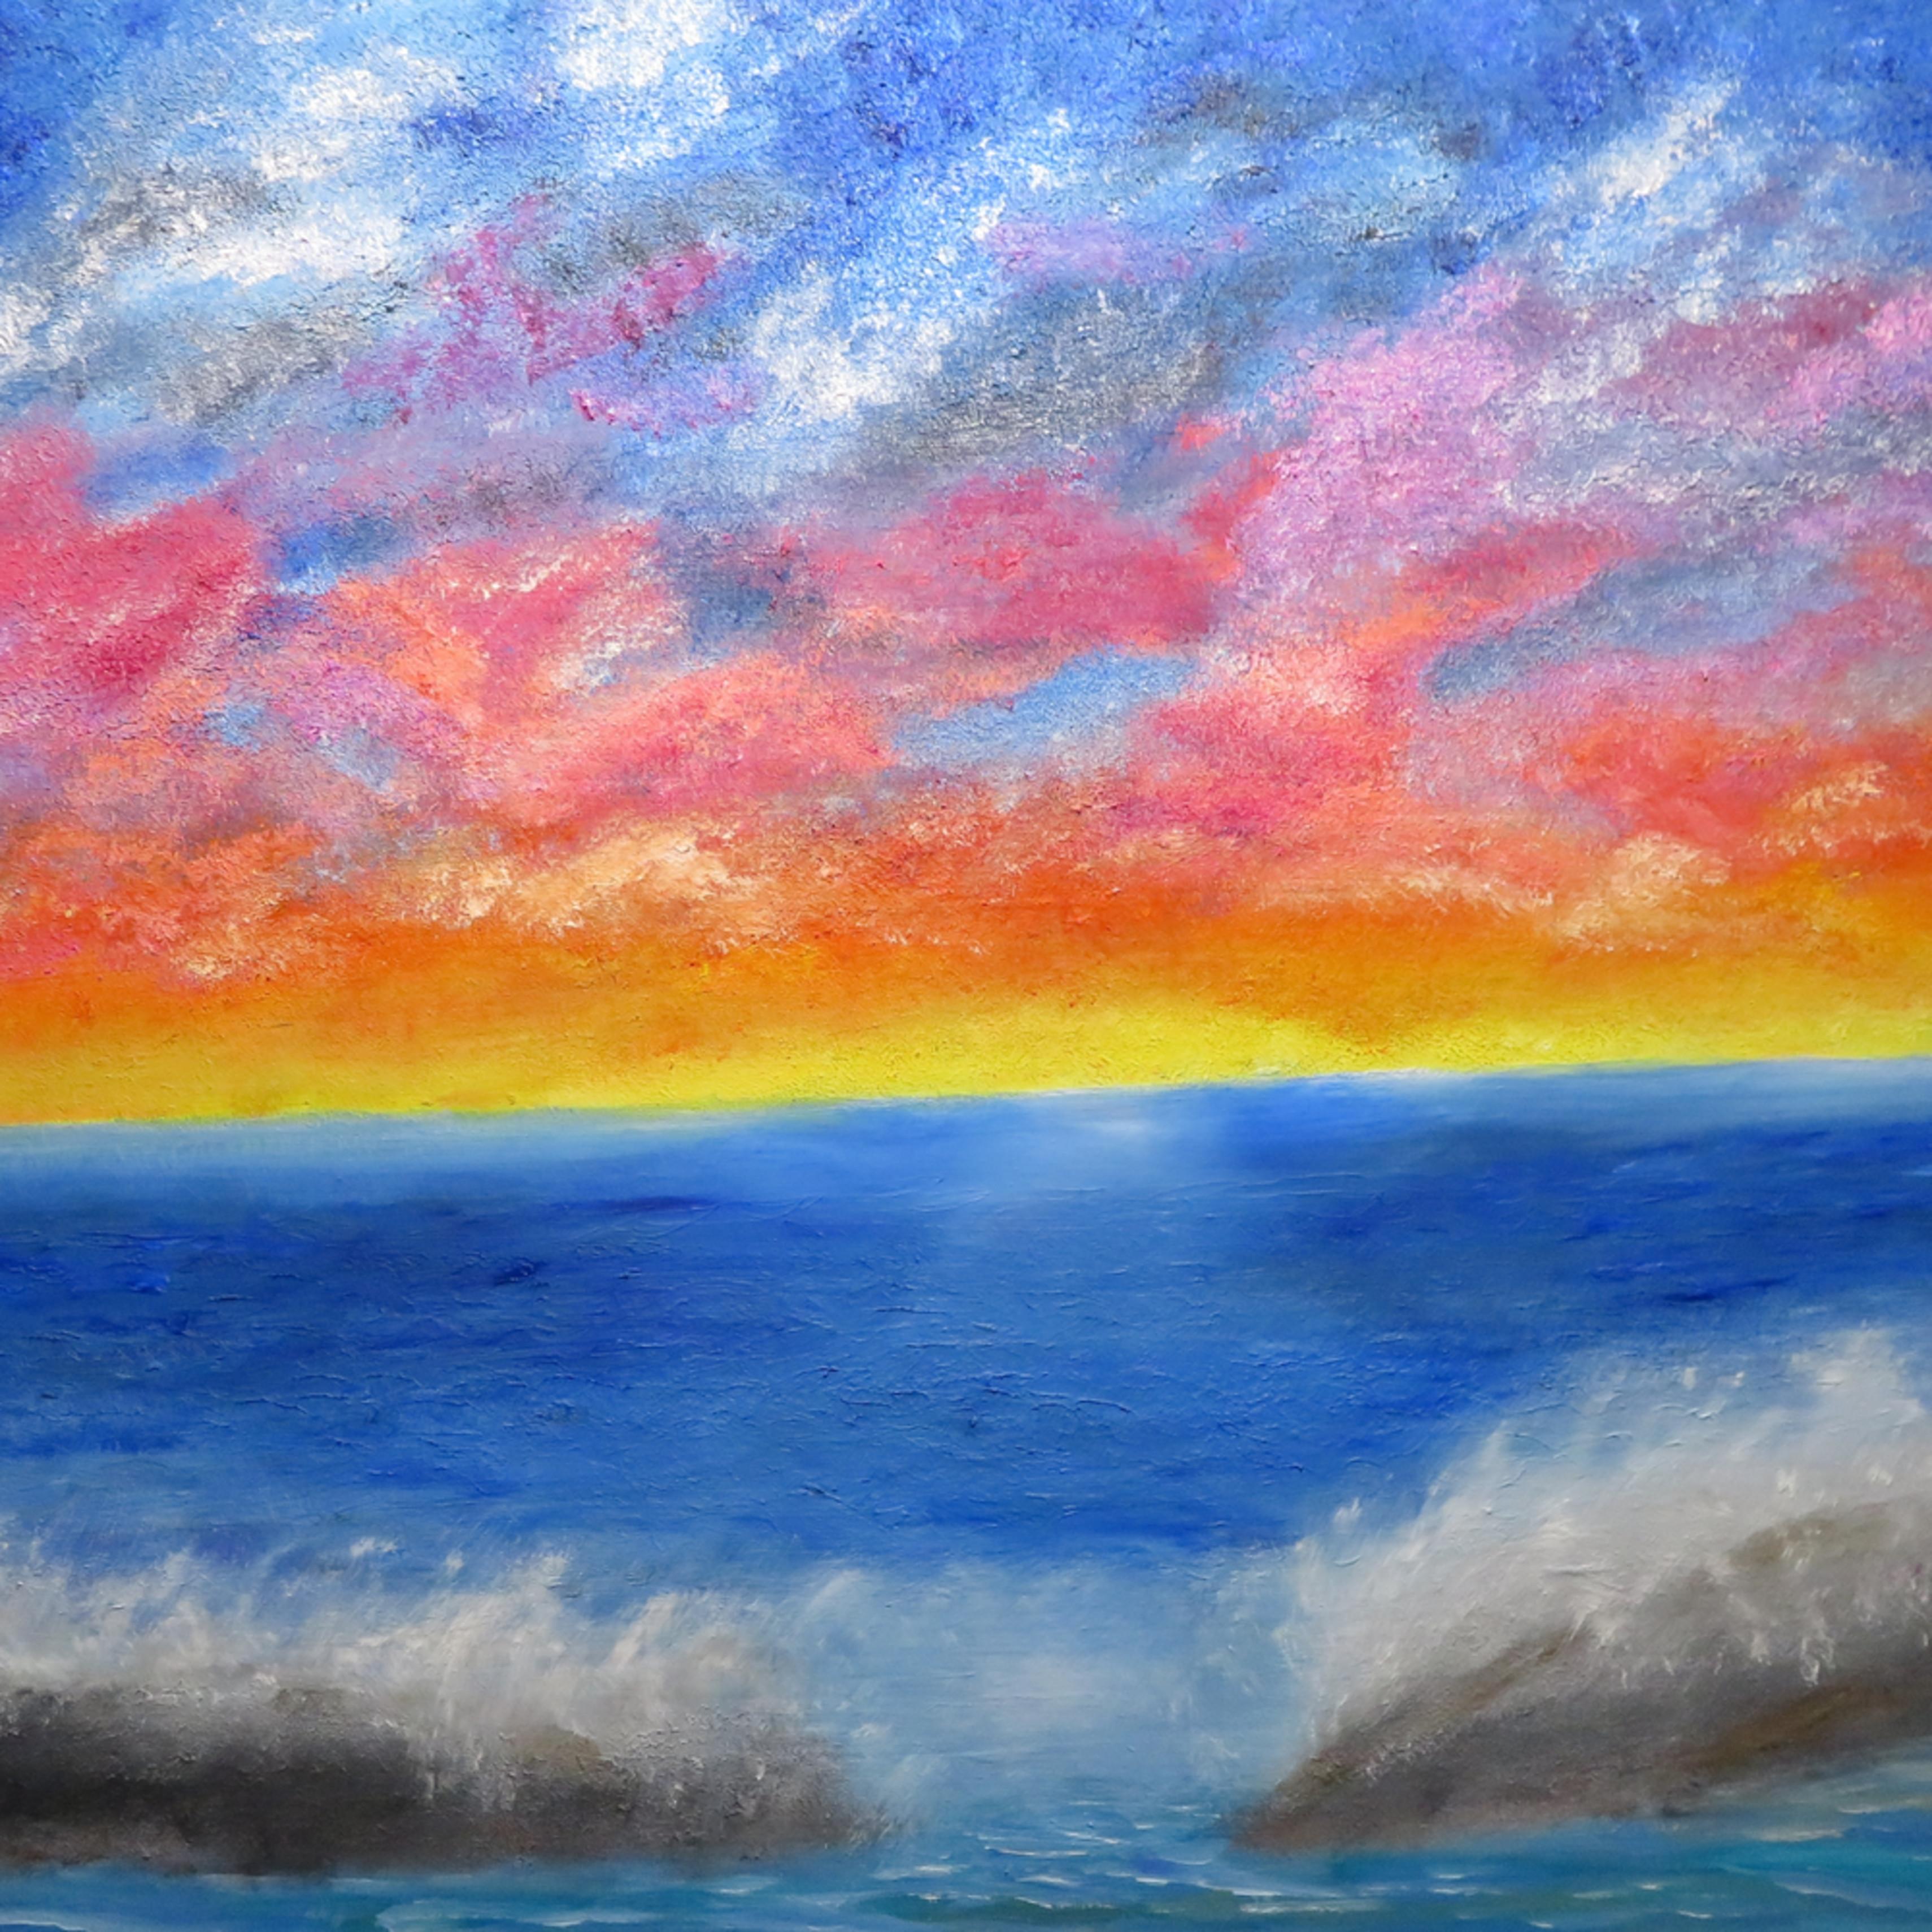 Coastal splash inpixio2 emmraw